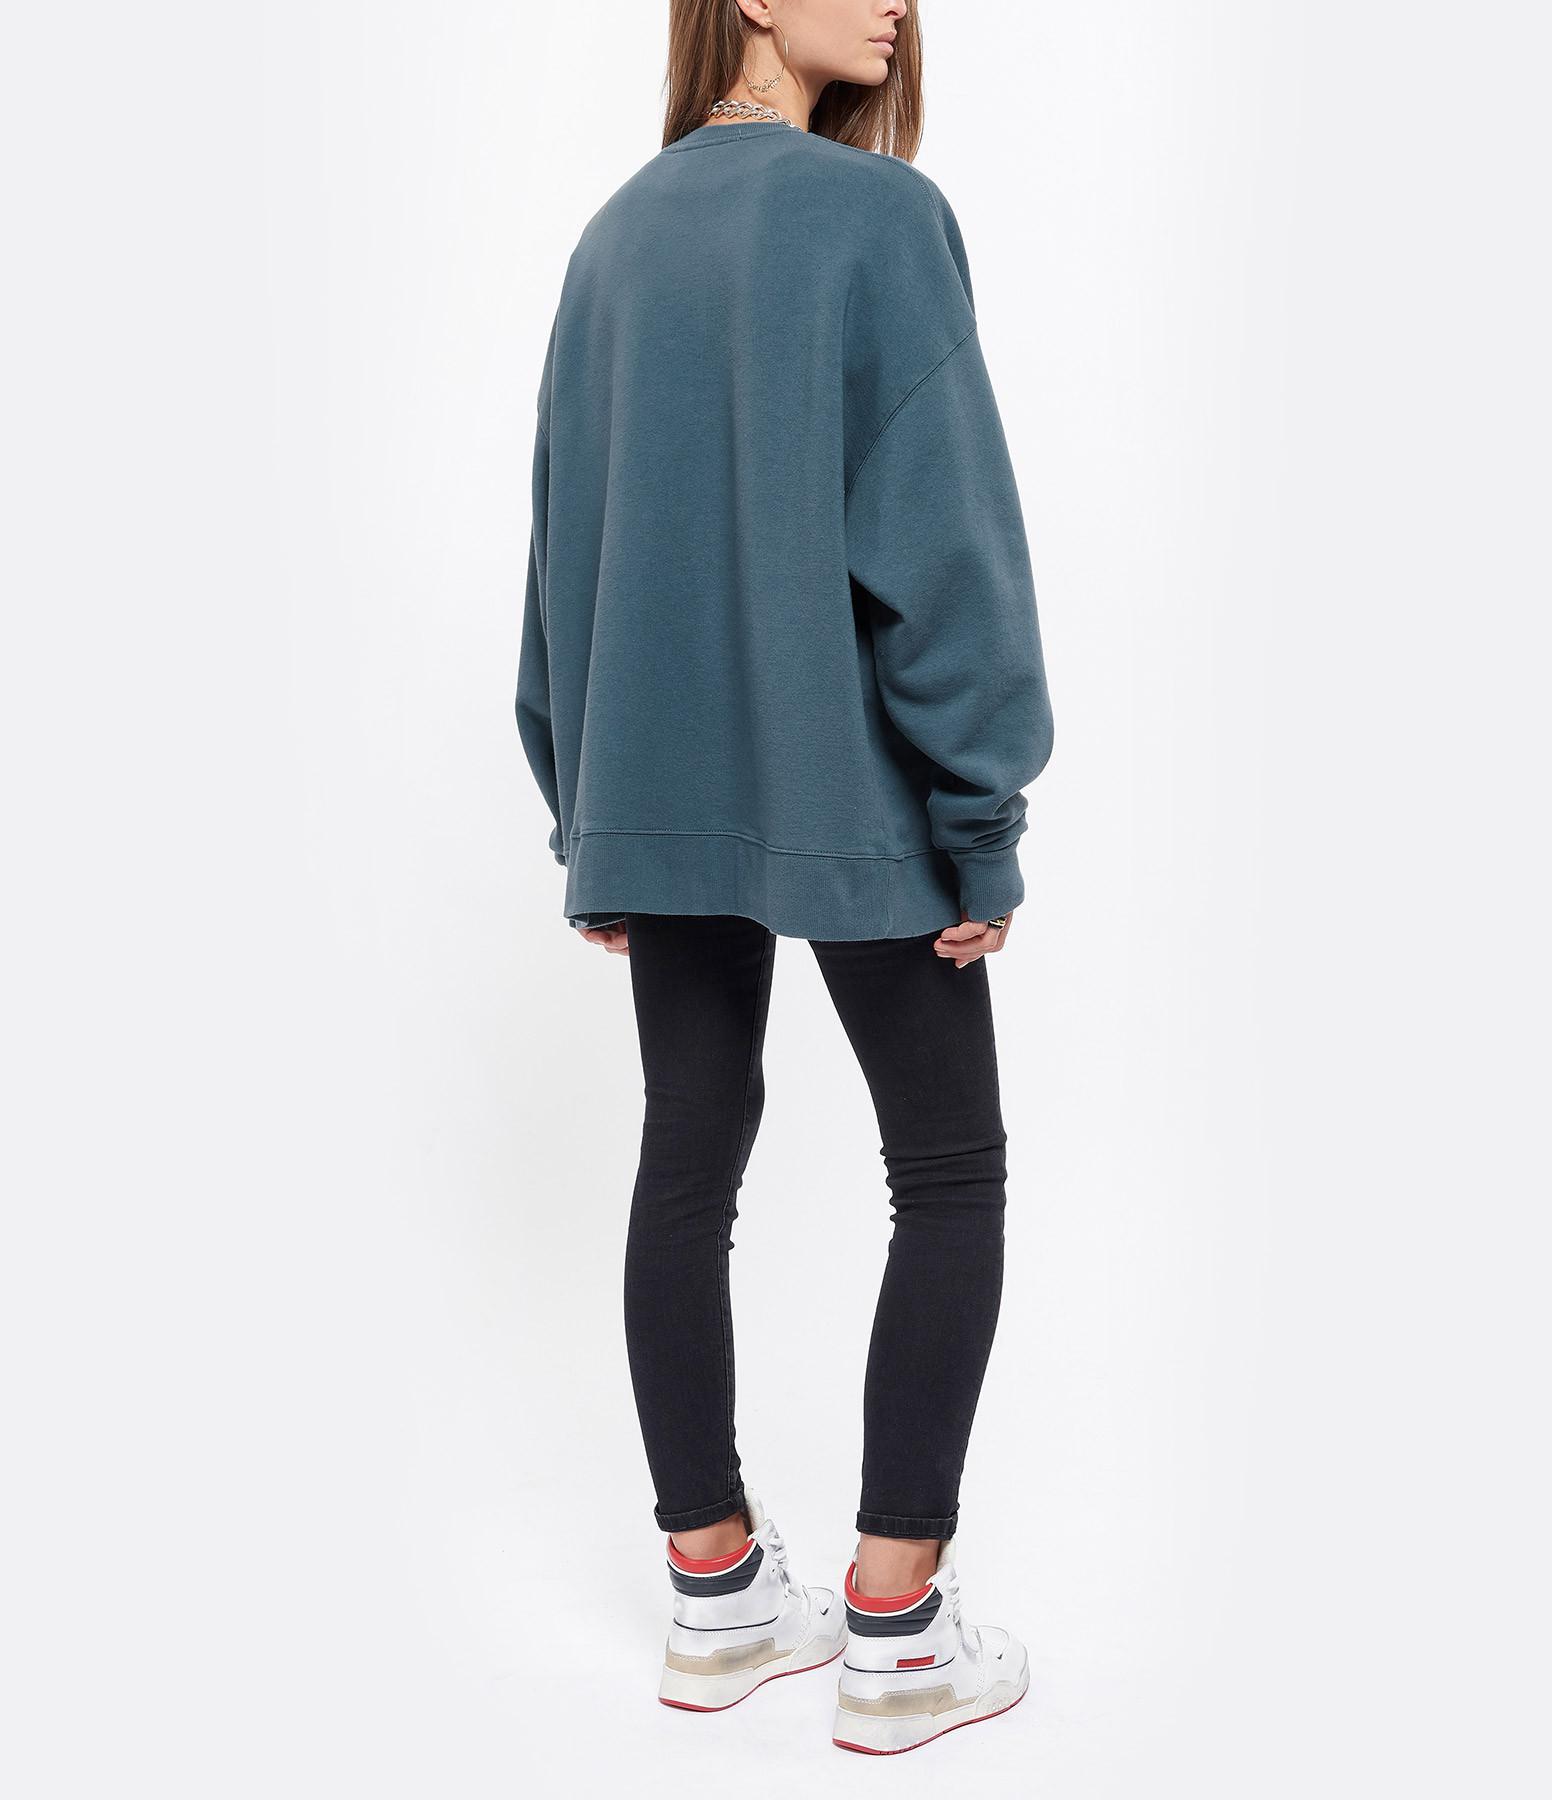 ROTATE - Sweatshirt Iris Coton Biologique Bleu, Capsule Sun